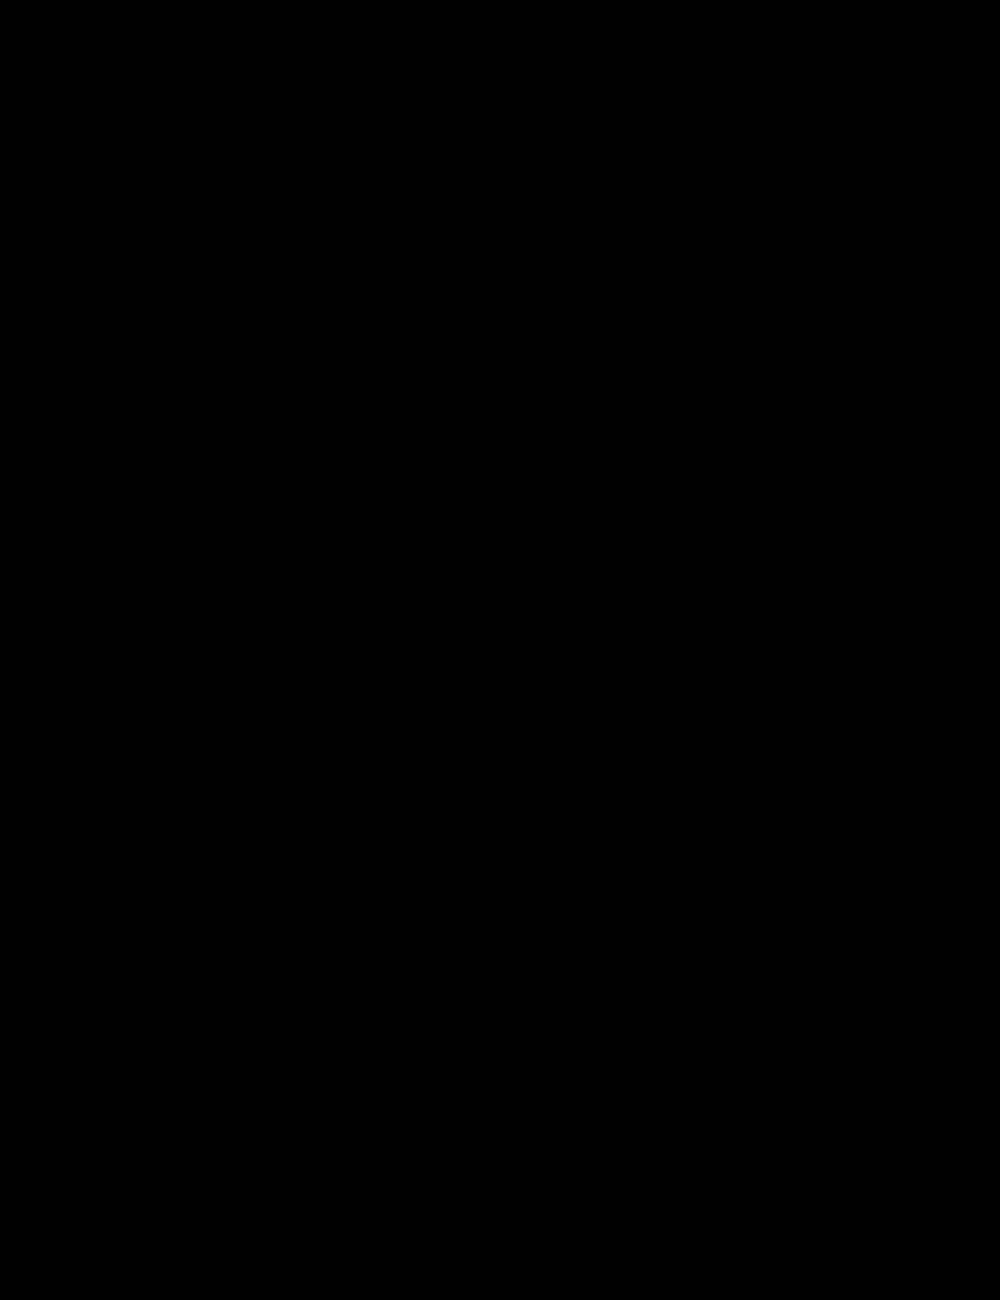 Le carré triangle